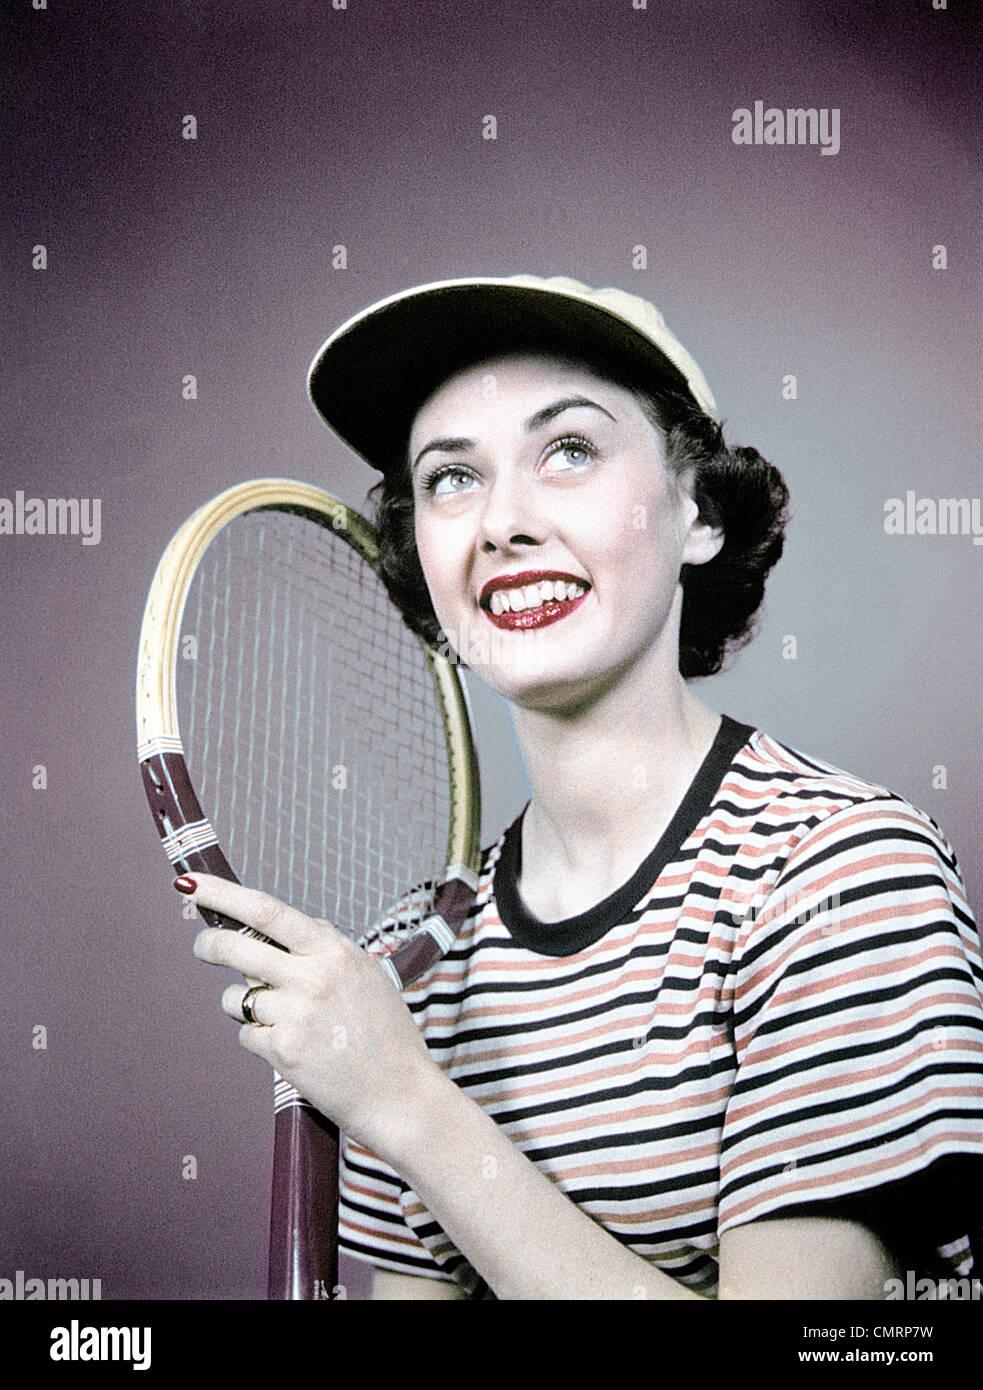 Anni Cinquanta sorridente BRUNETTE DONNA HOLDING racchetta da tennis Wear Camicia a Righe CAP Immagini Stock